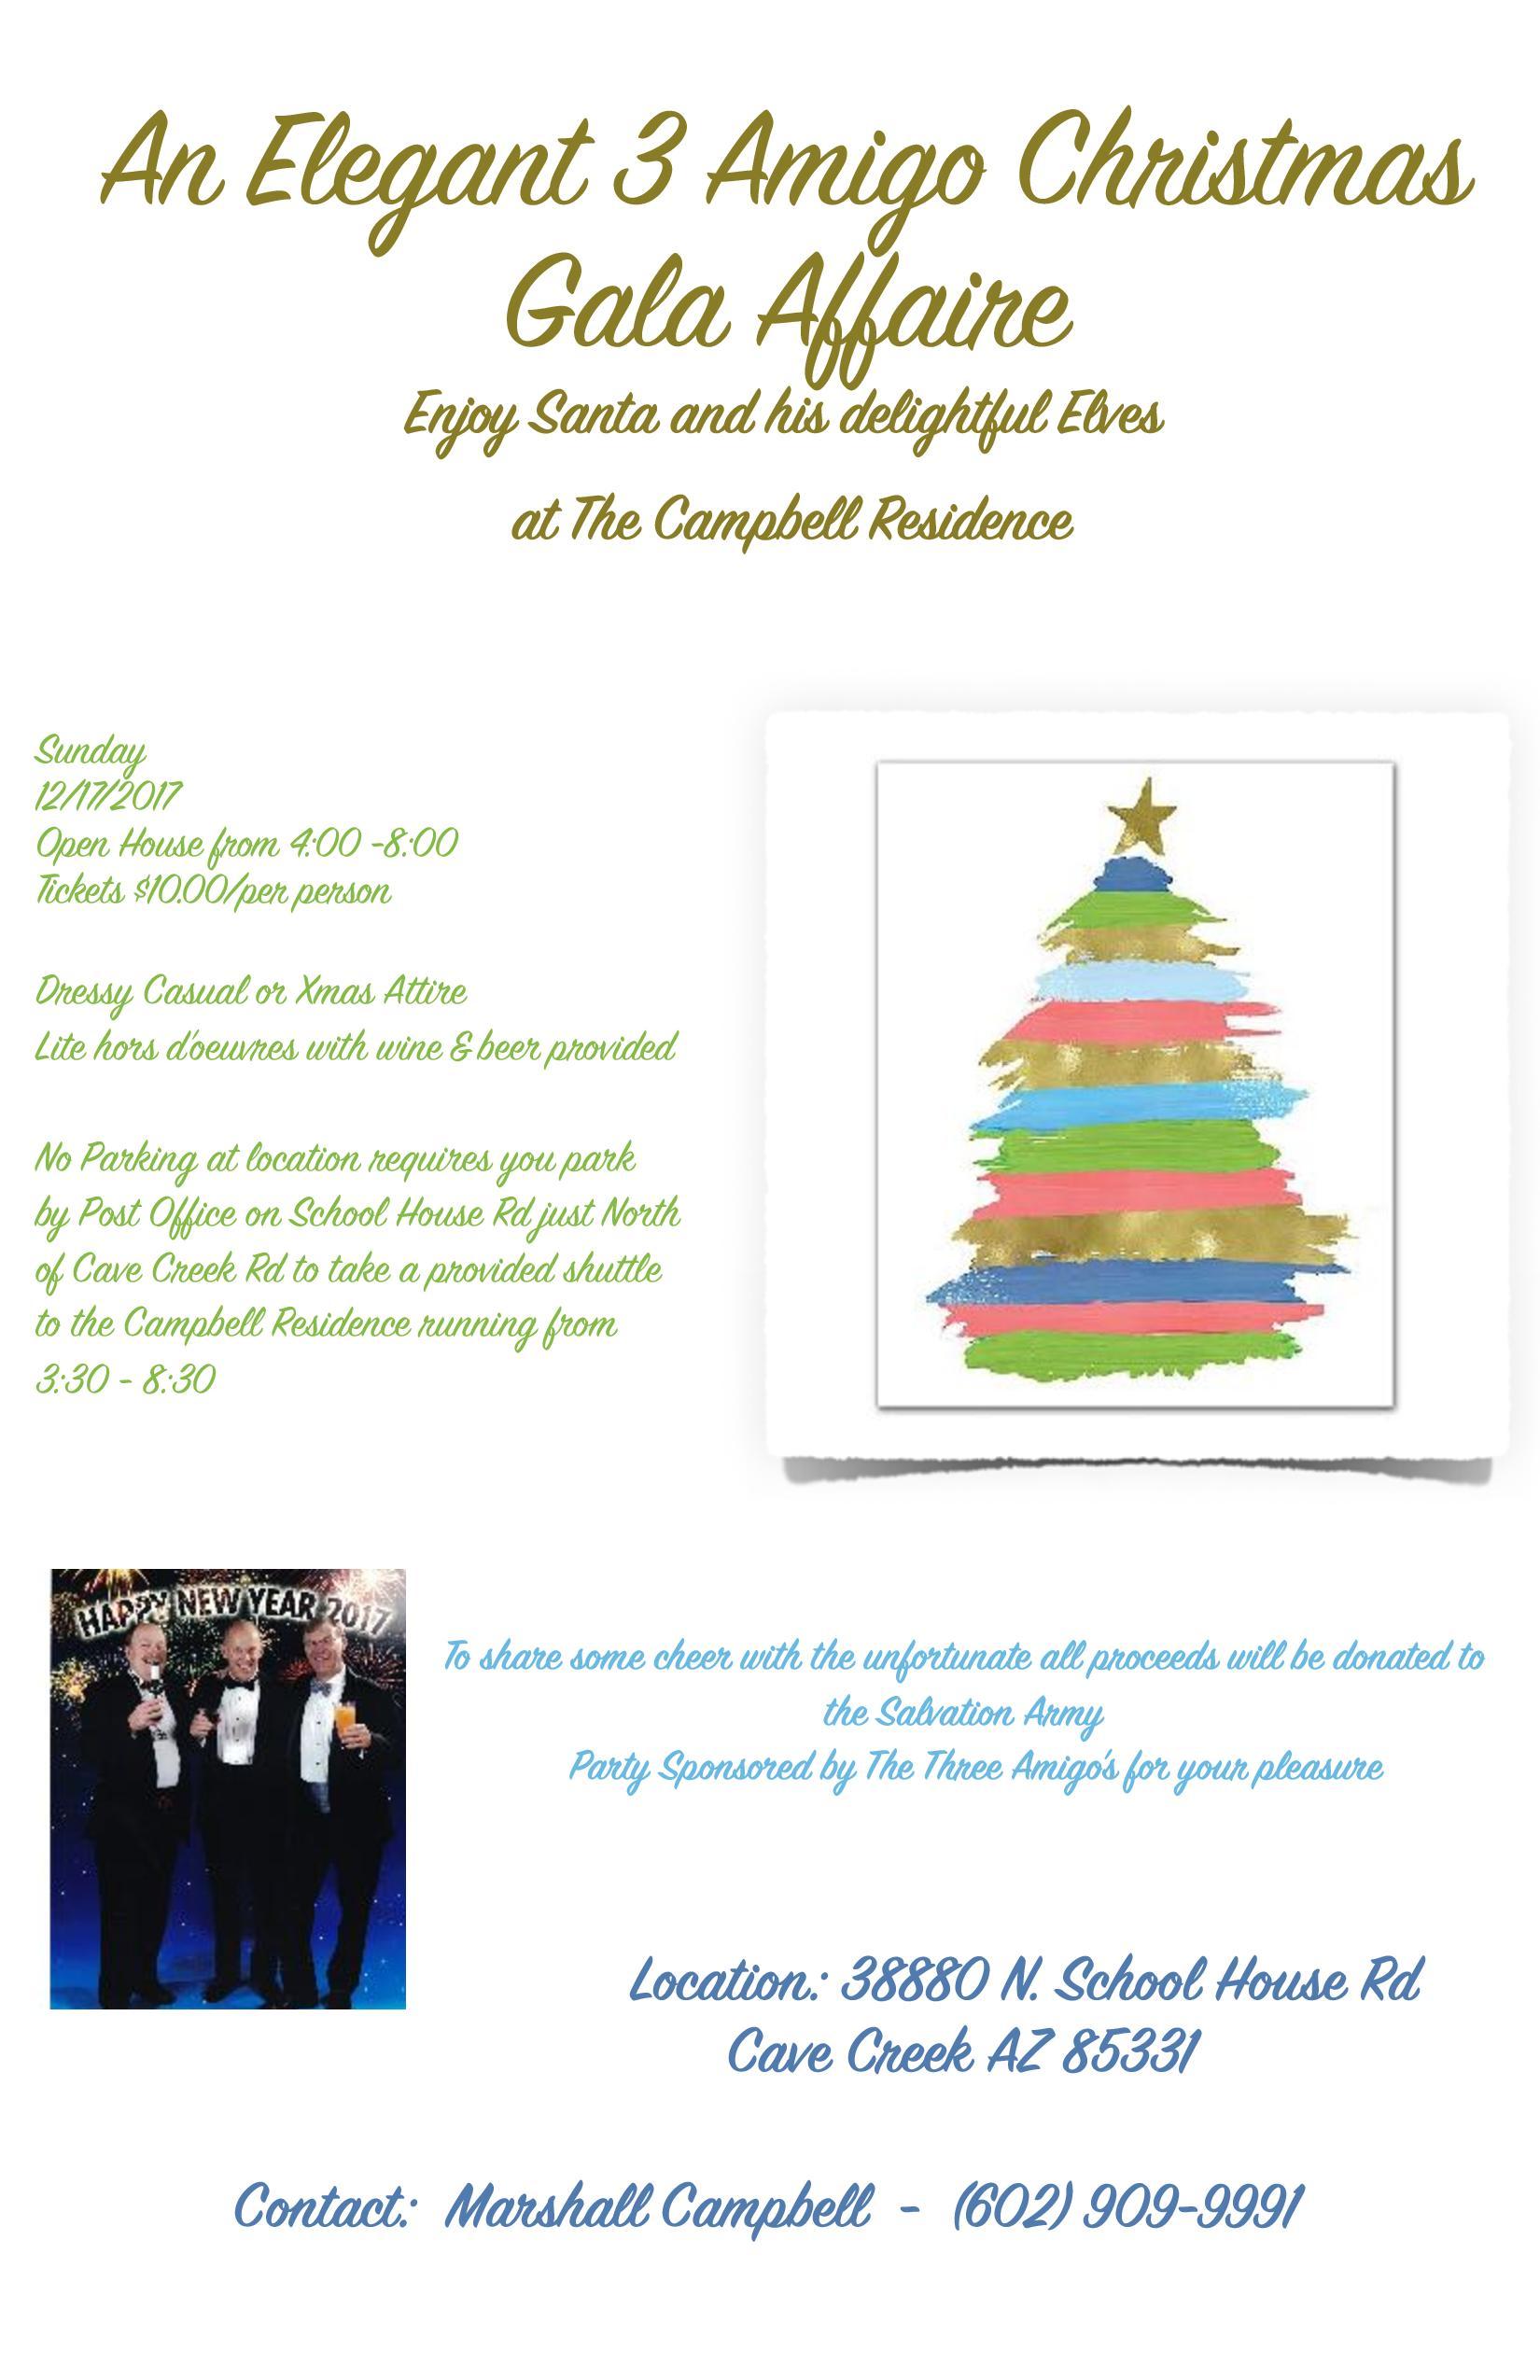 3 Amigos Christmas Gala Affaire - Events - Scottsdale Sea and Ski Club